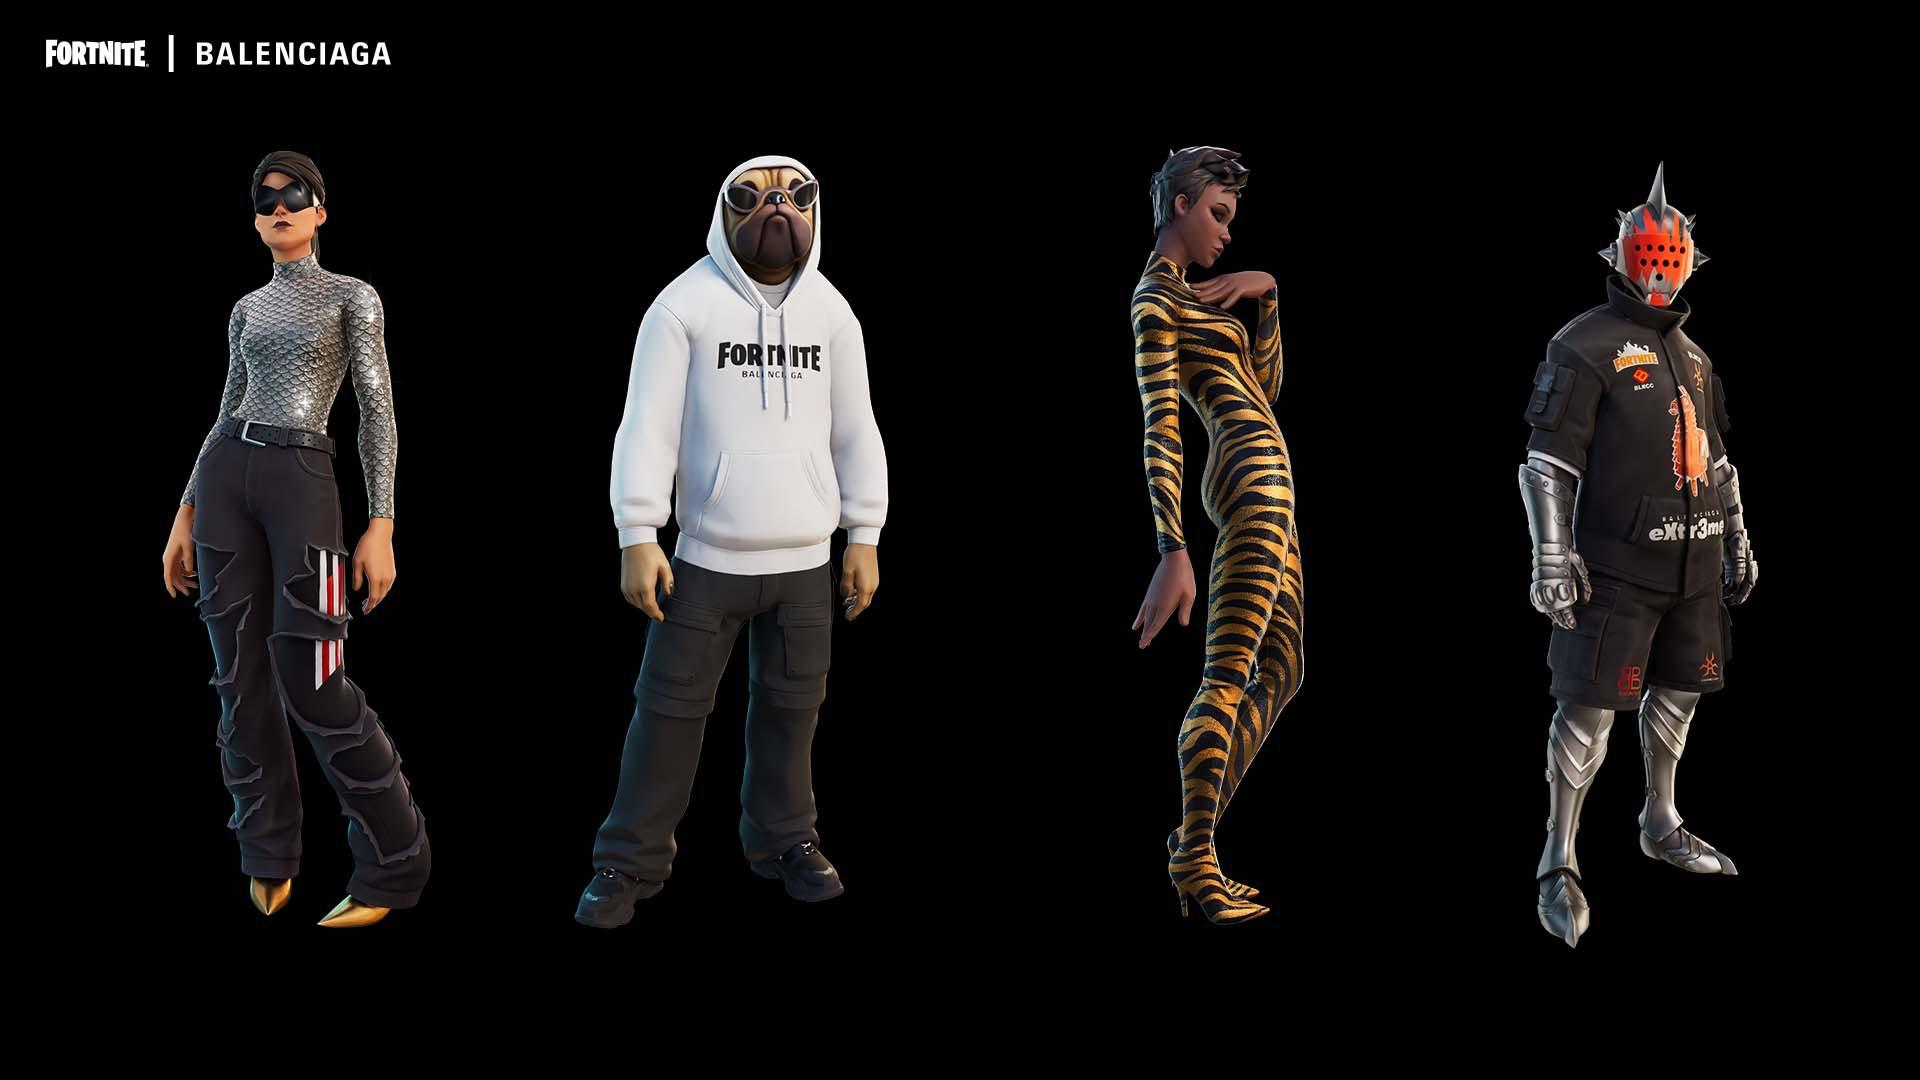 Skins from Balenciaga\'s Fortnite collaboration. Courtesy.